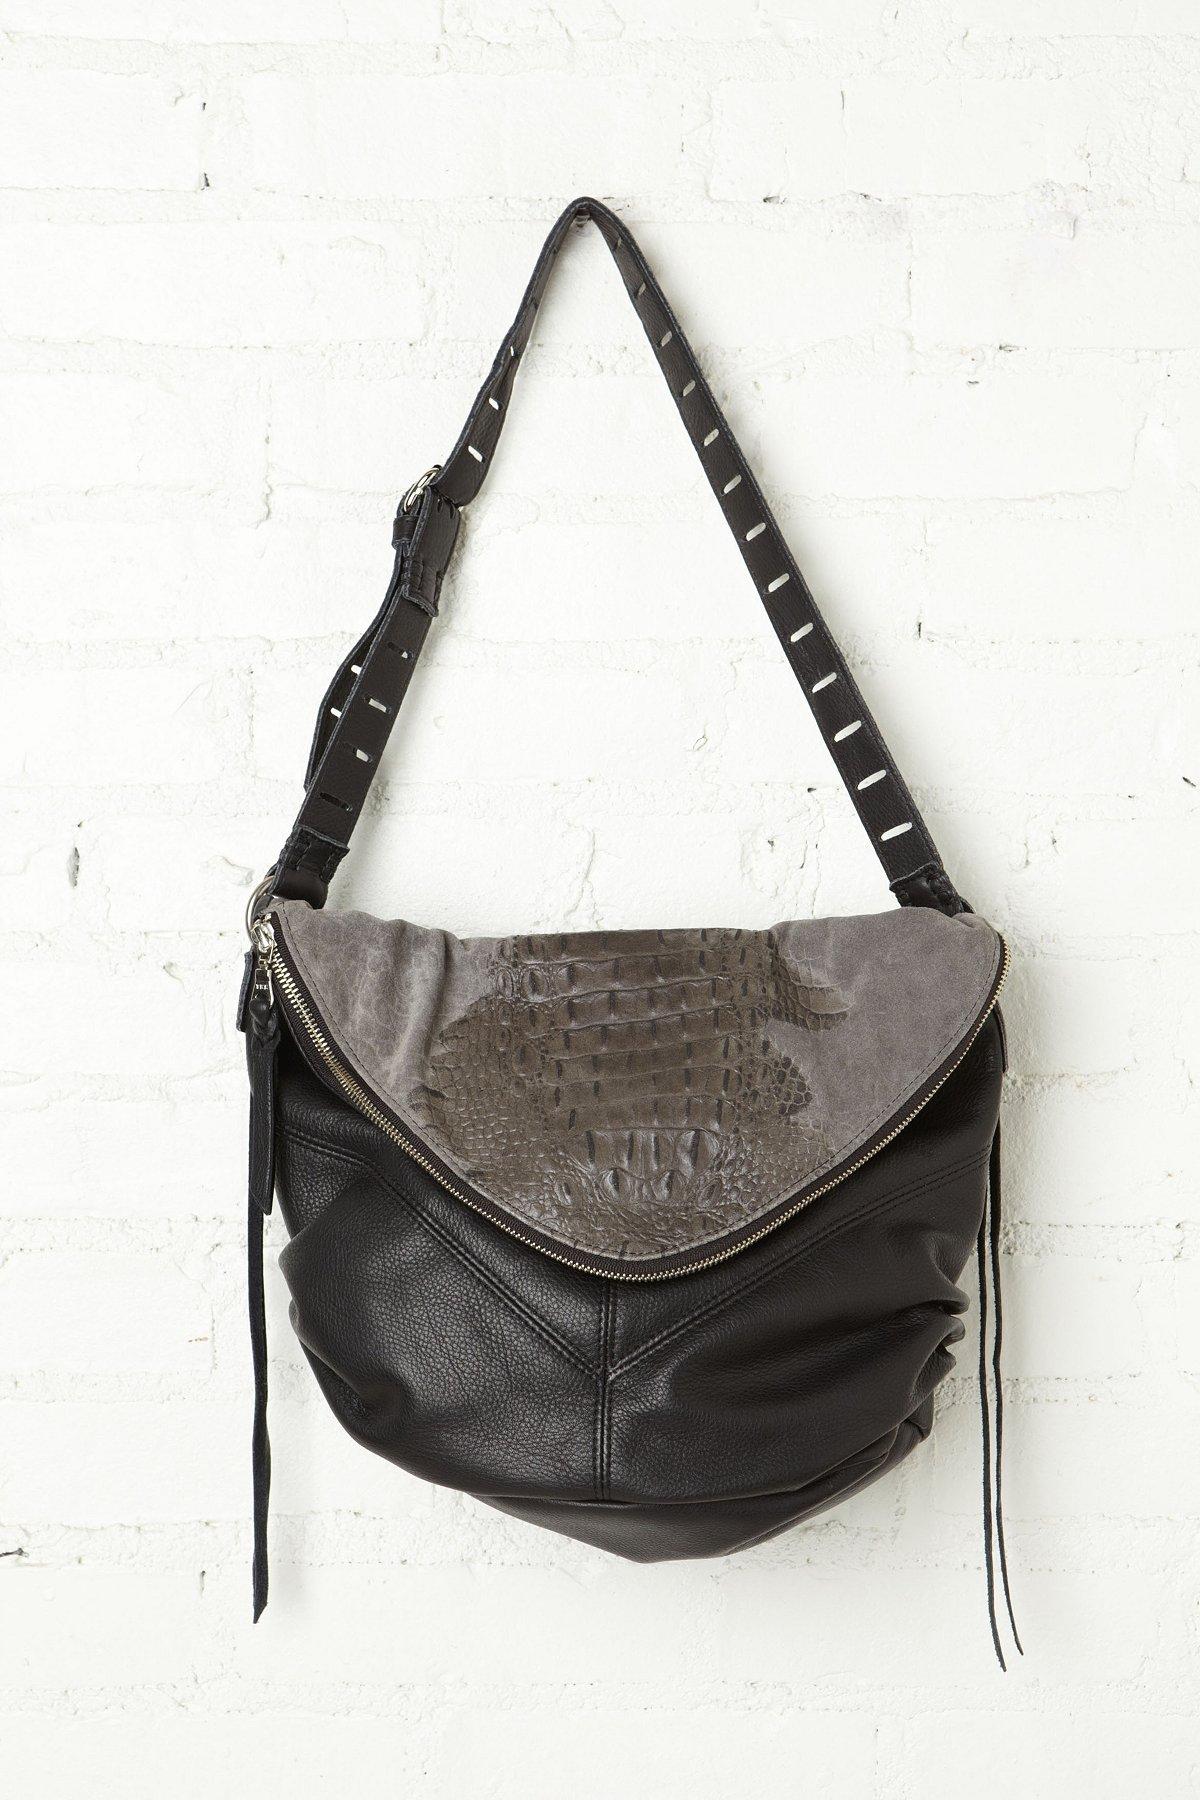 Browning Embossed Bag